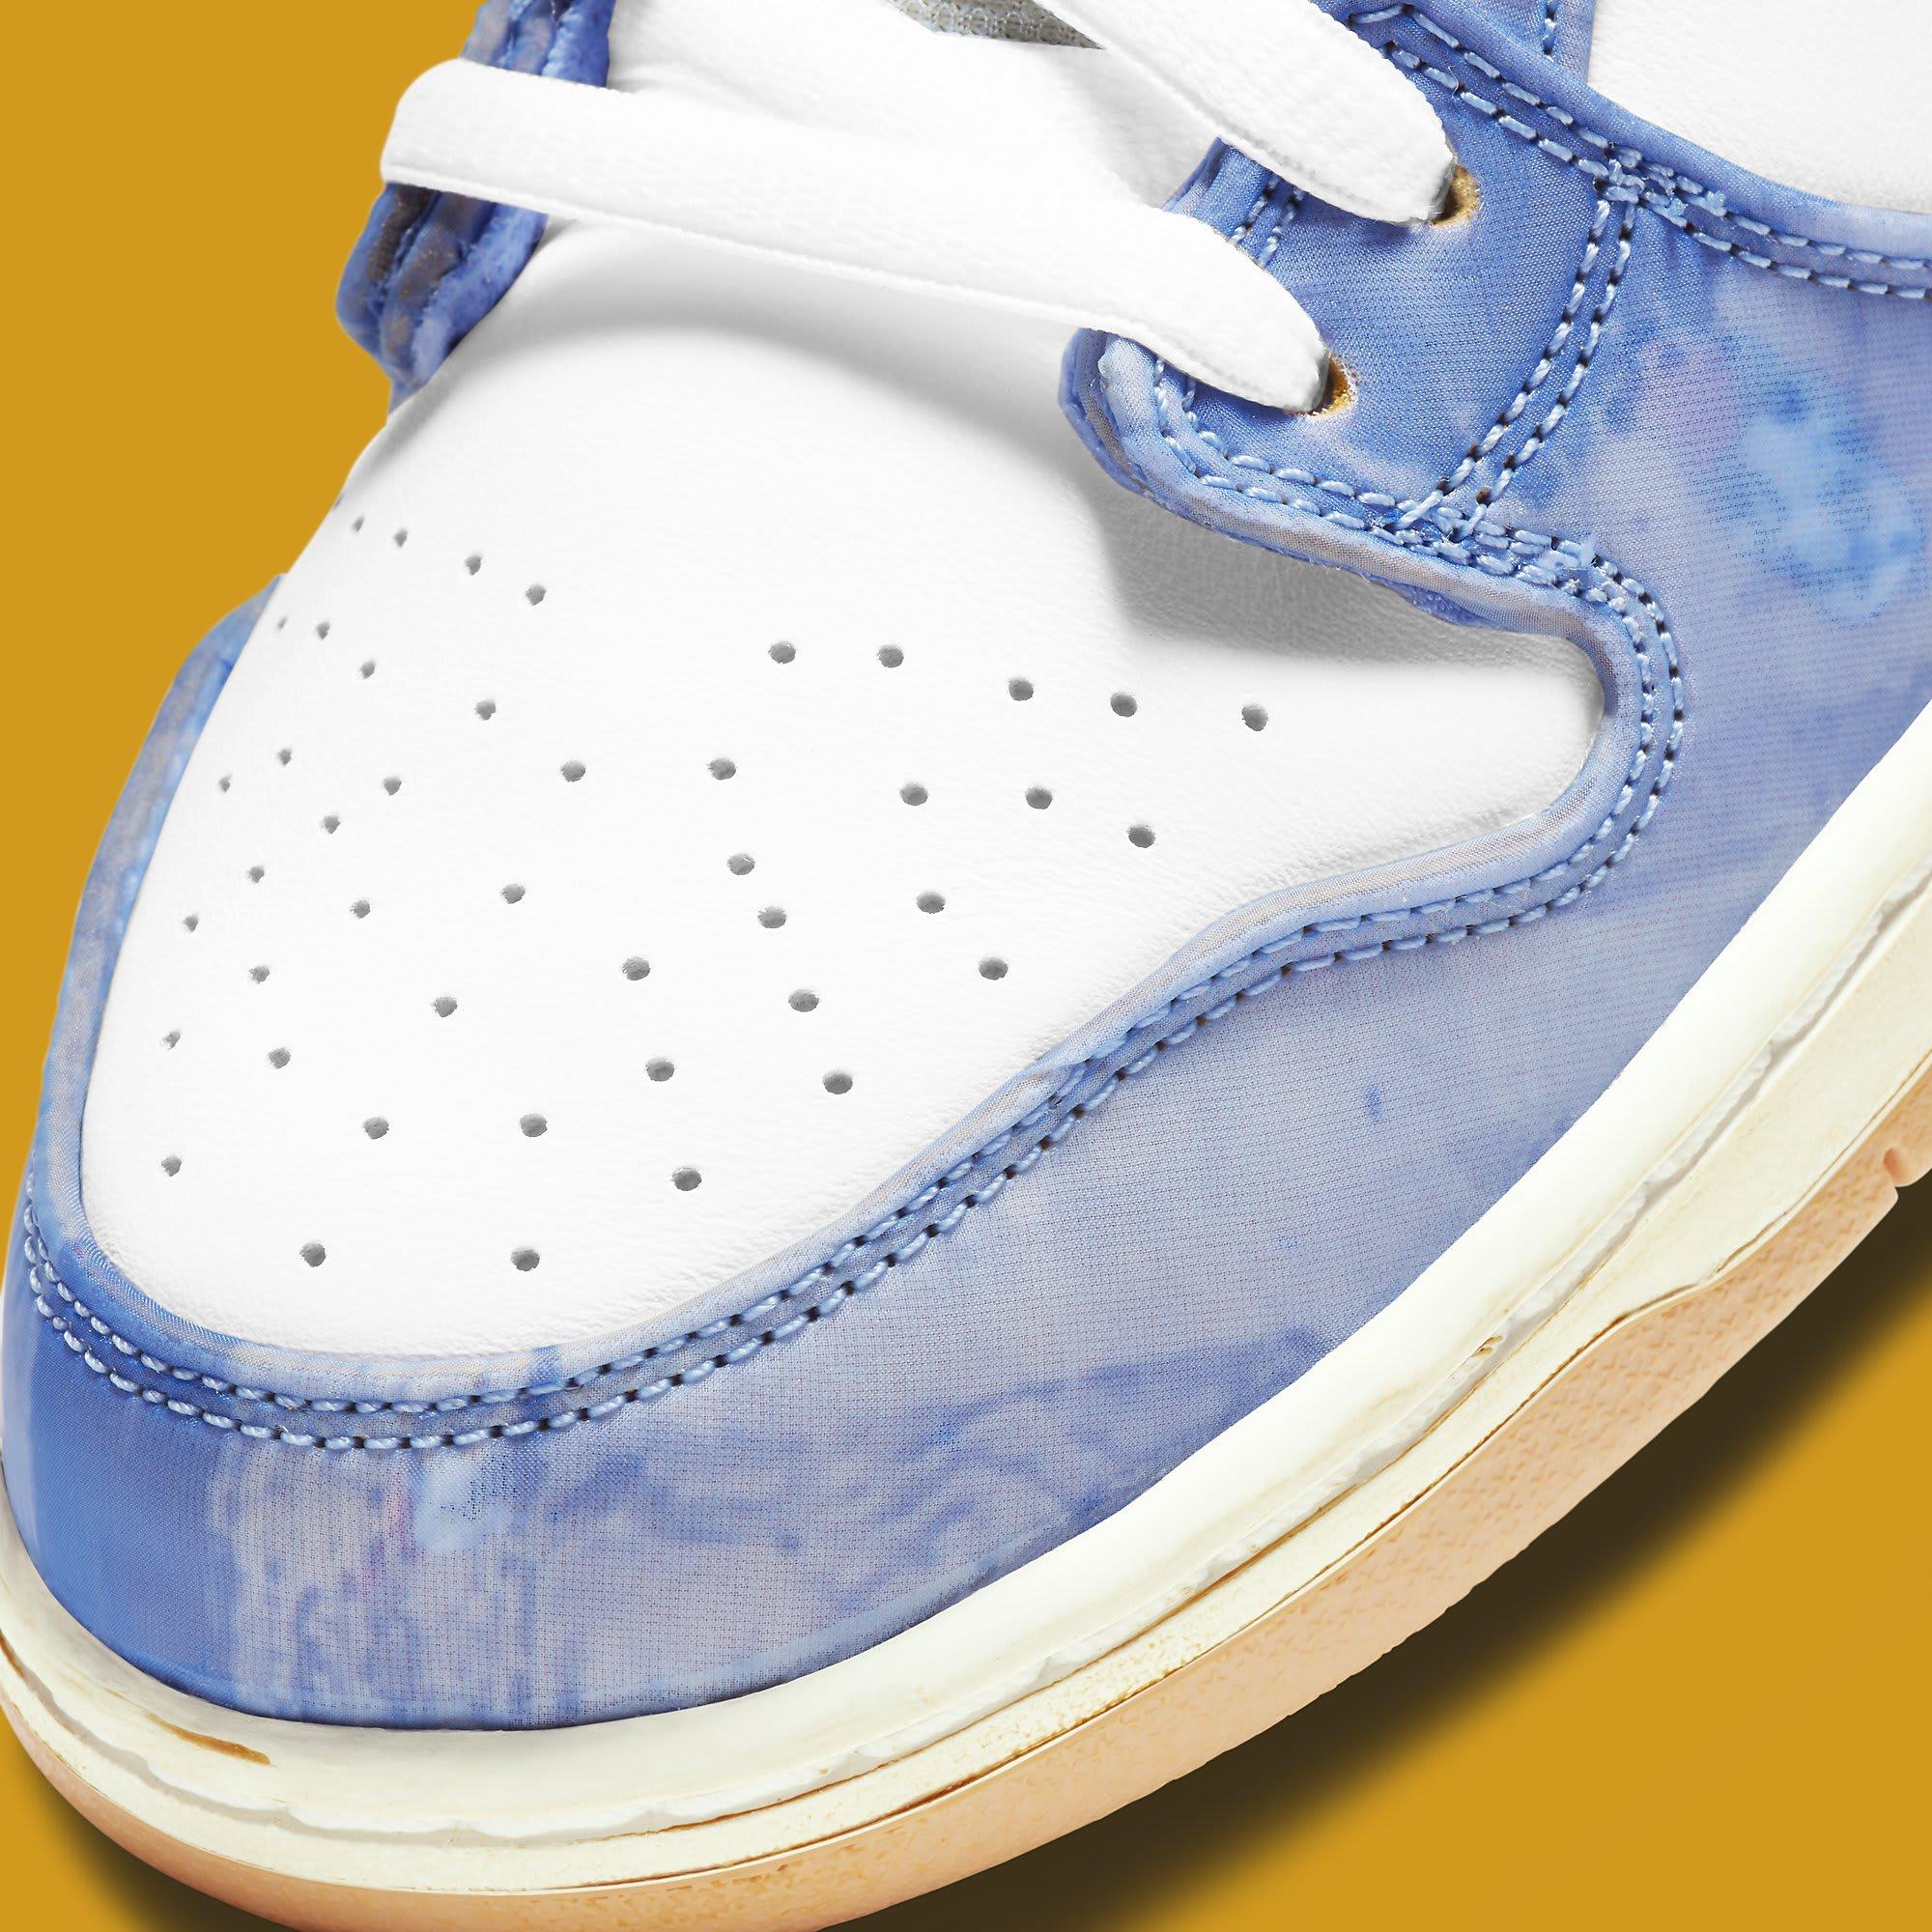 Carpet Company x Nike SB Dunk High CV1677-100 Toe